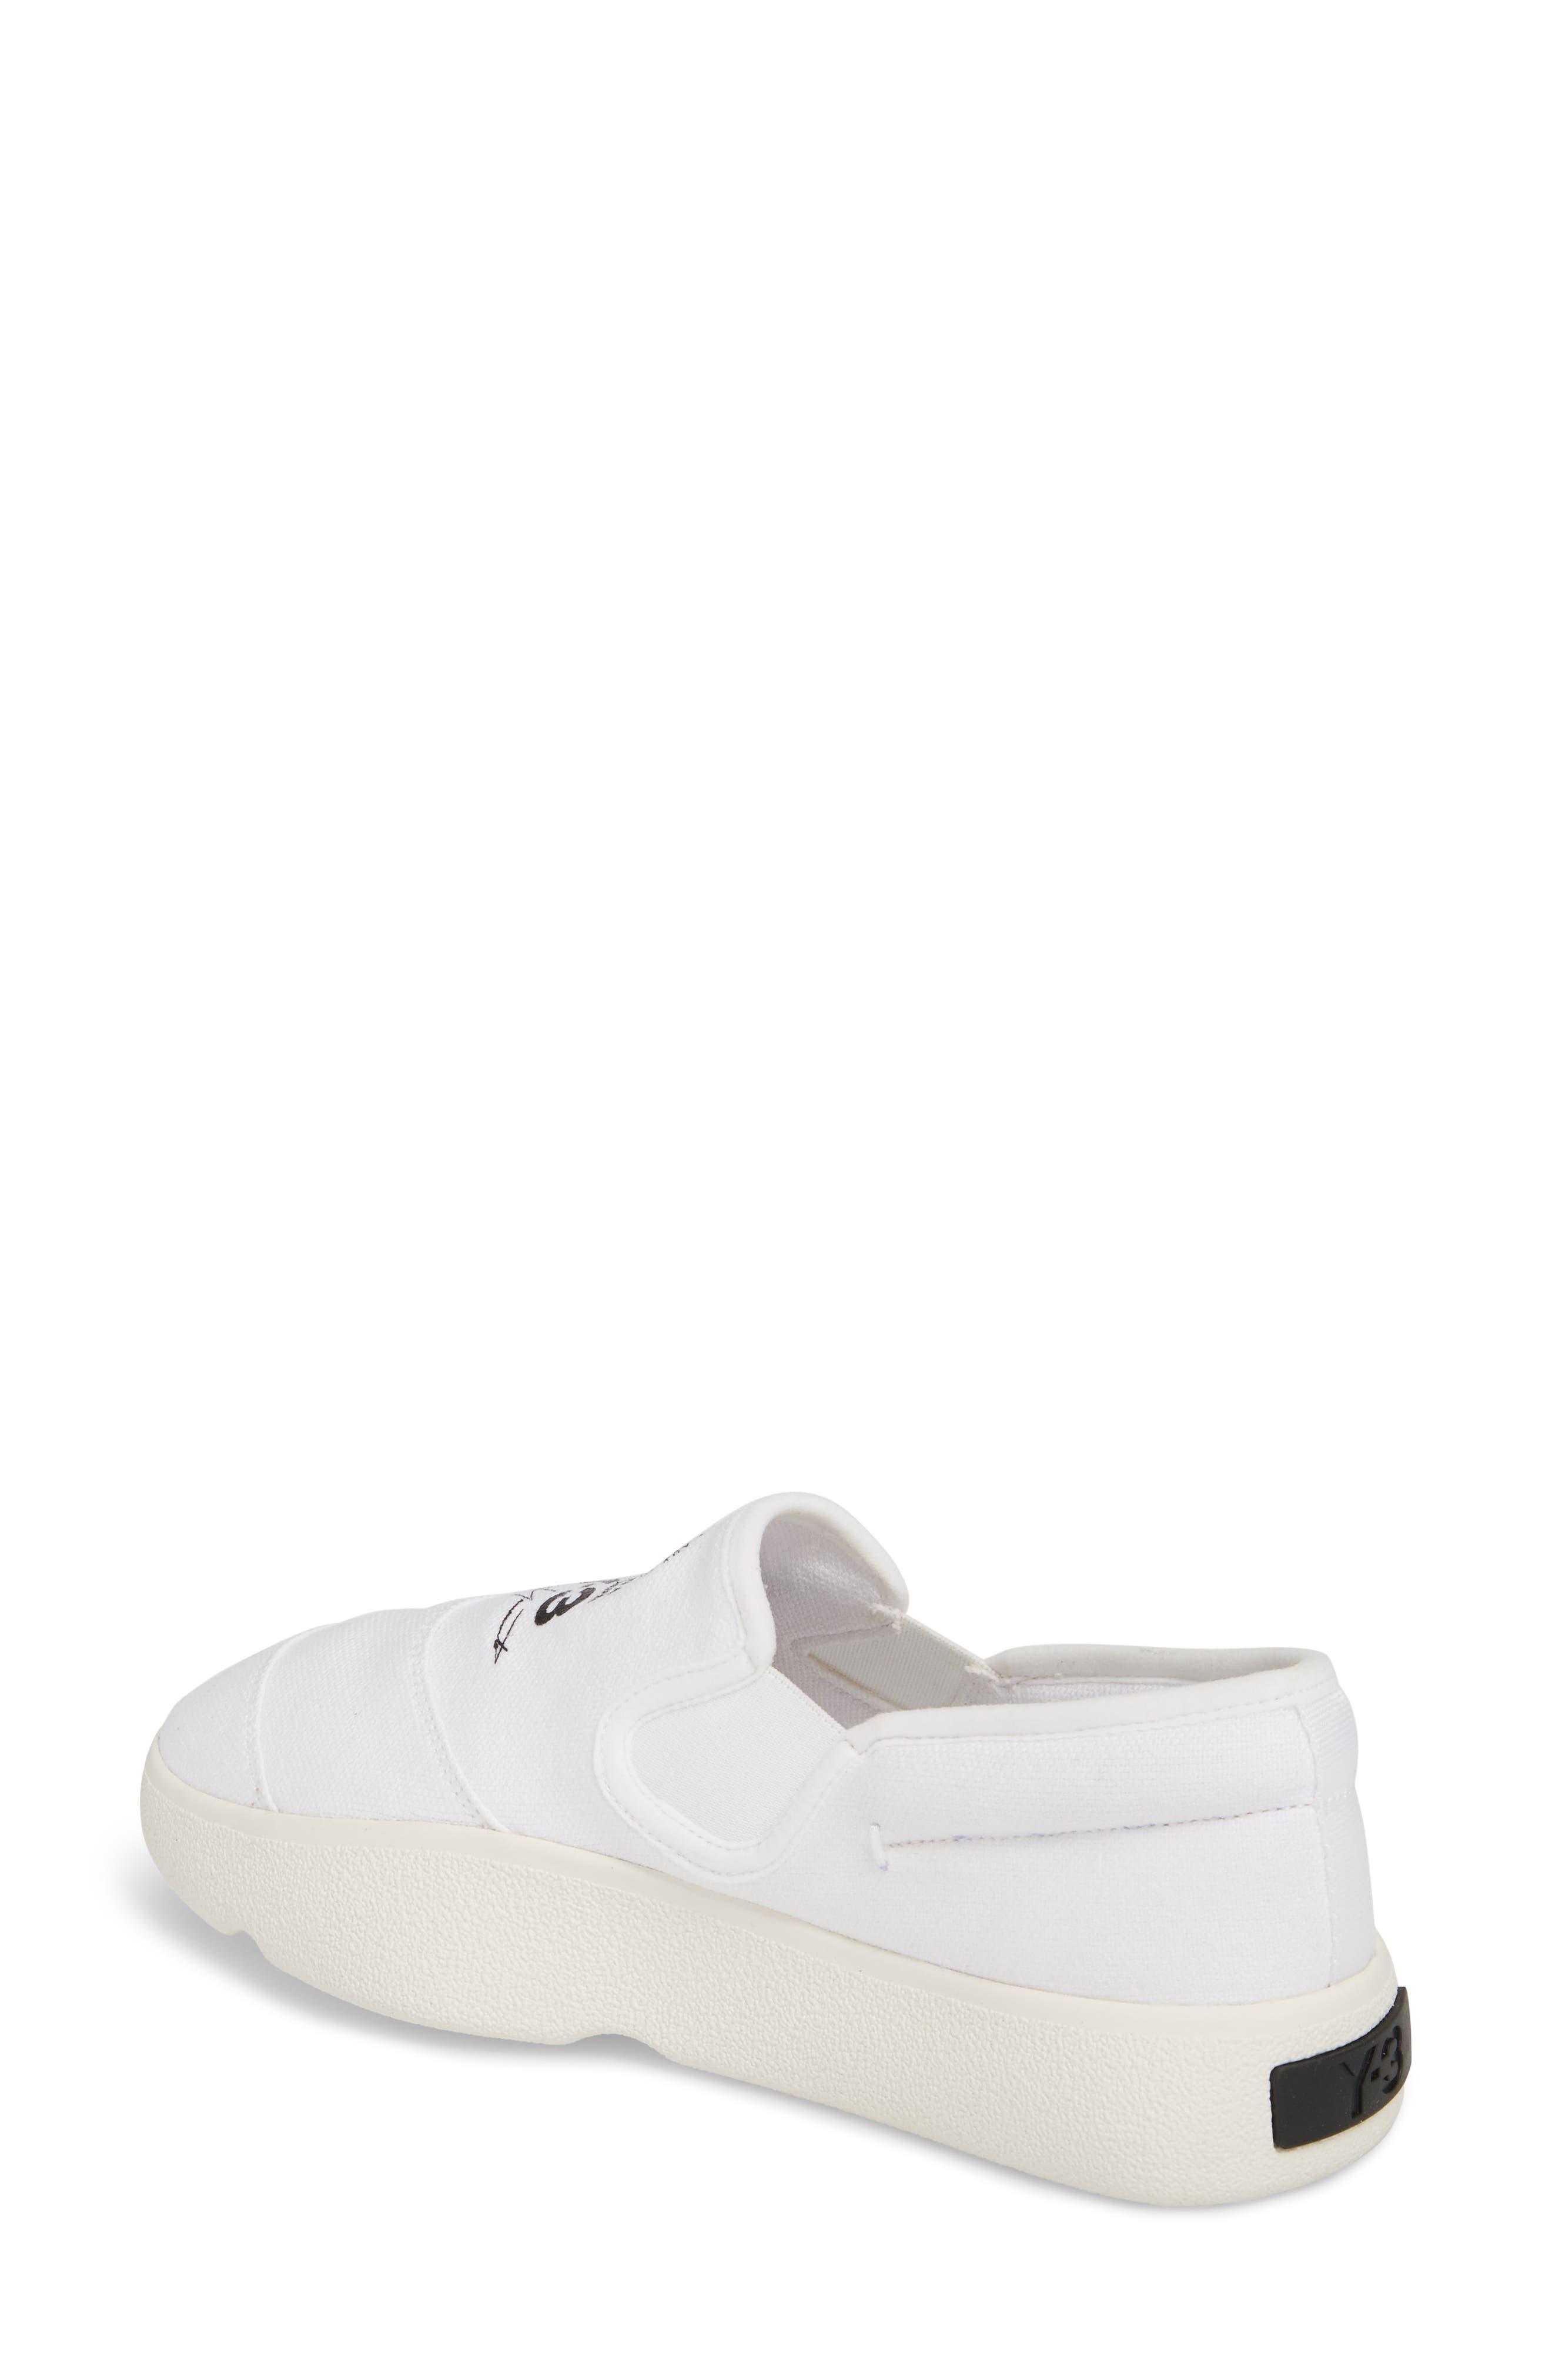 Tangutsu Slip-On Sneaker,                             Alternate thumbnail 2, color,                             White / Black / Core White